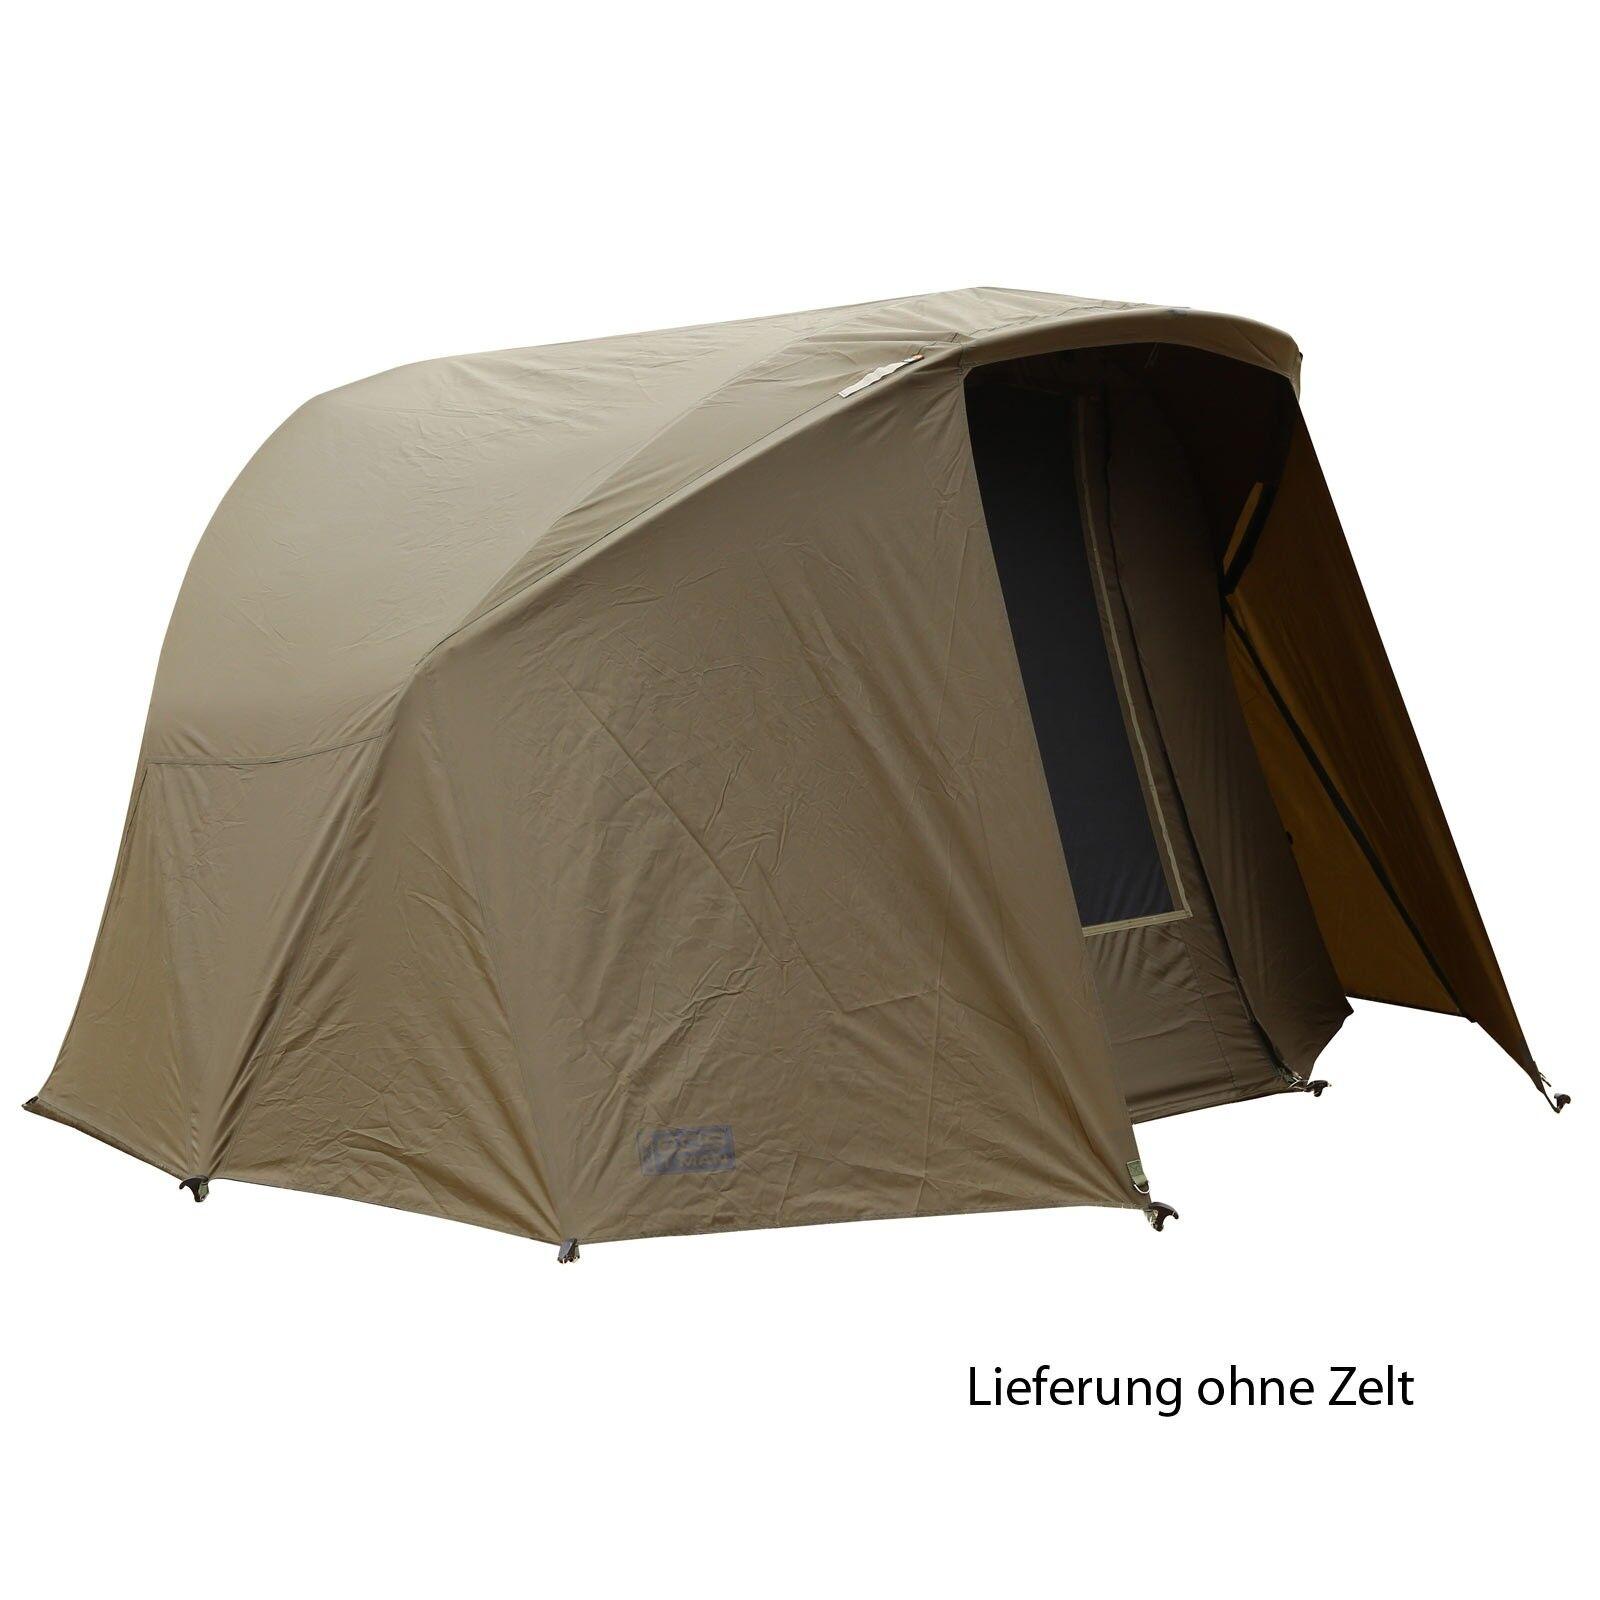 Fox Fishing Throw For Fishing Tent-EOS 1-homme Bivvy Skin 1,8kg